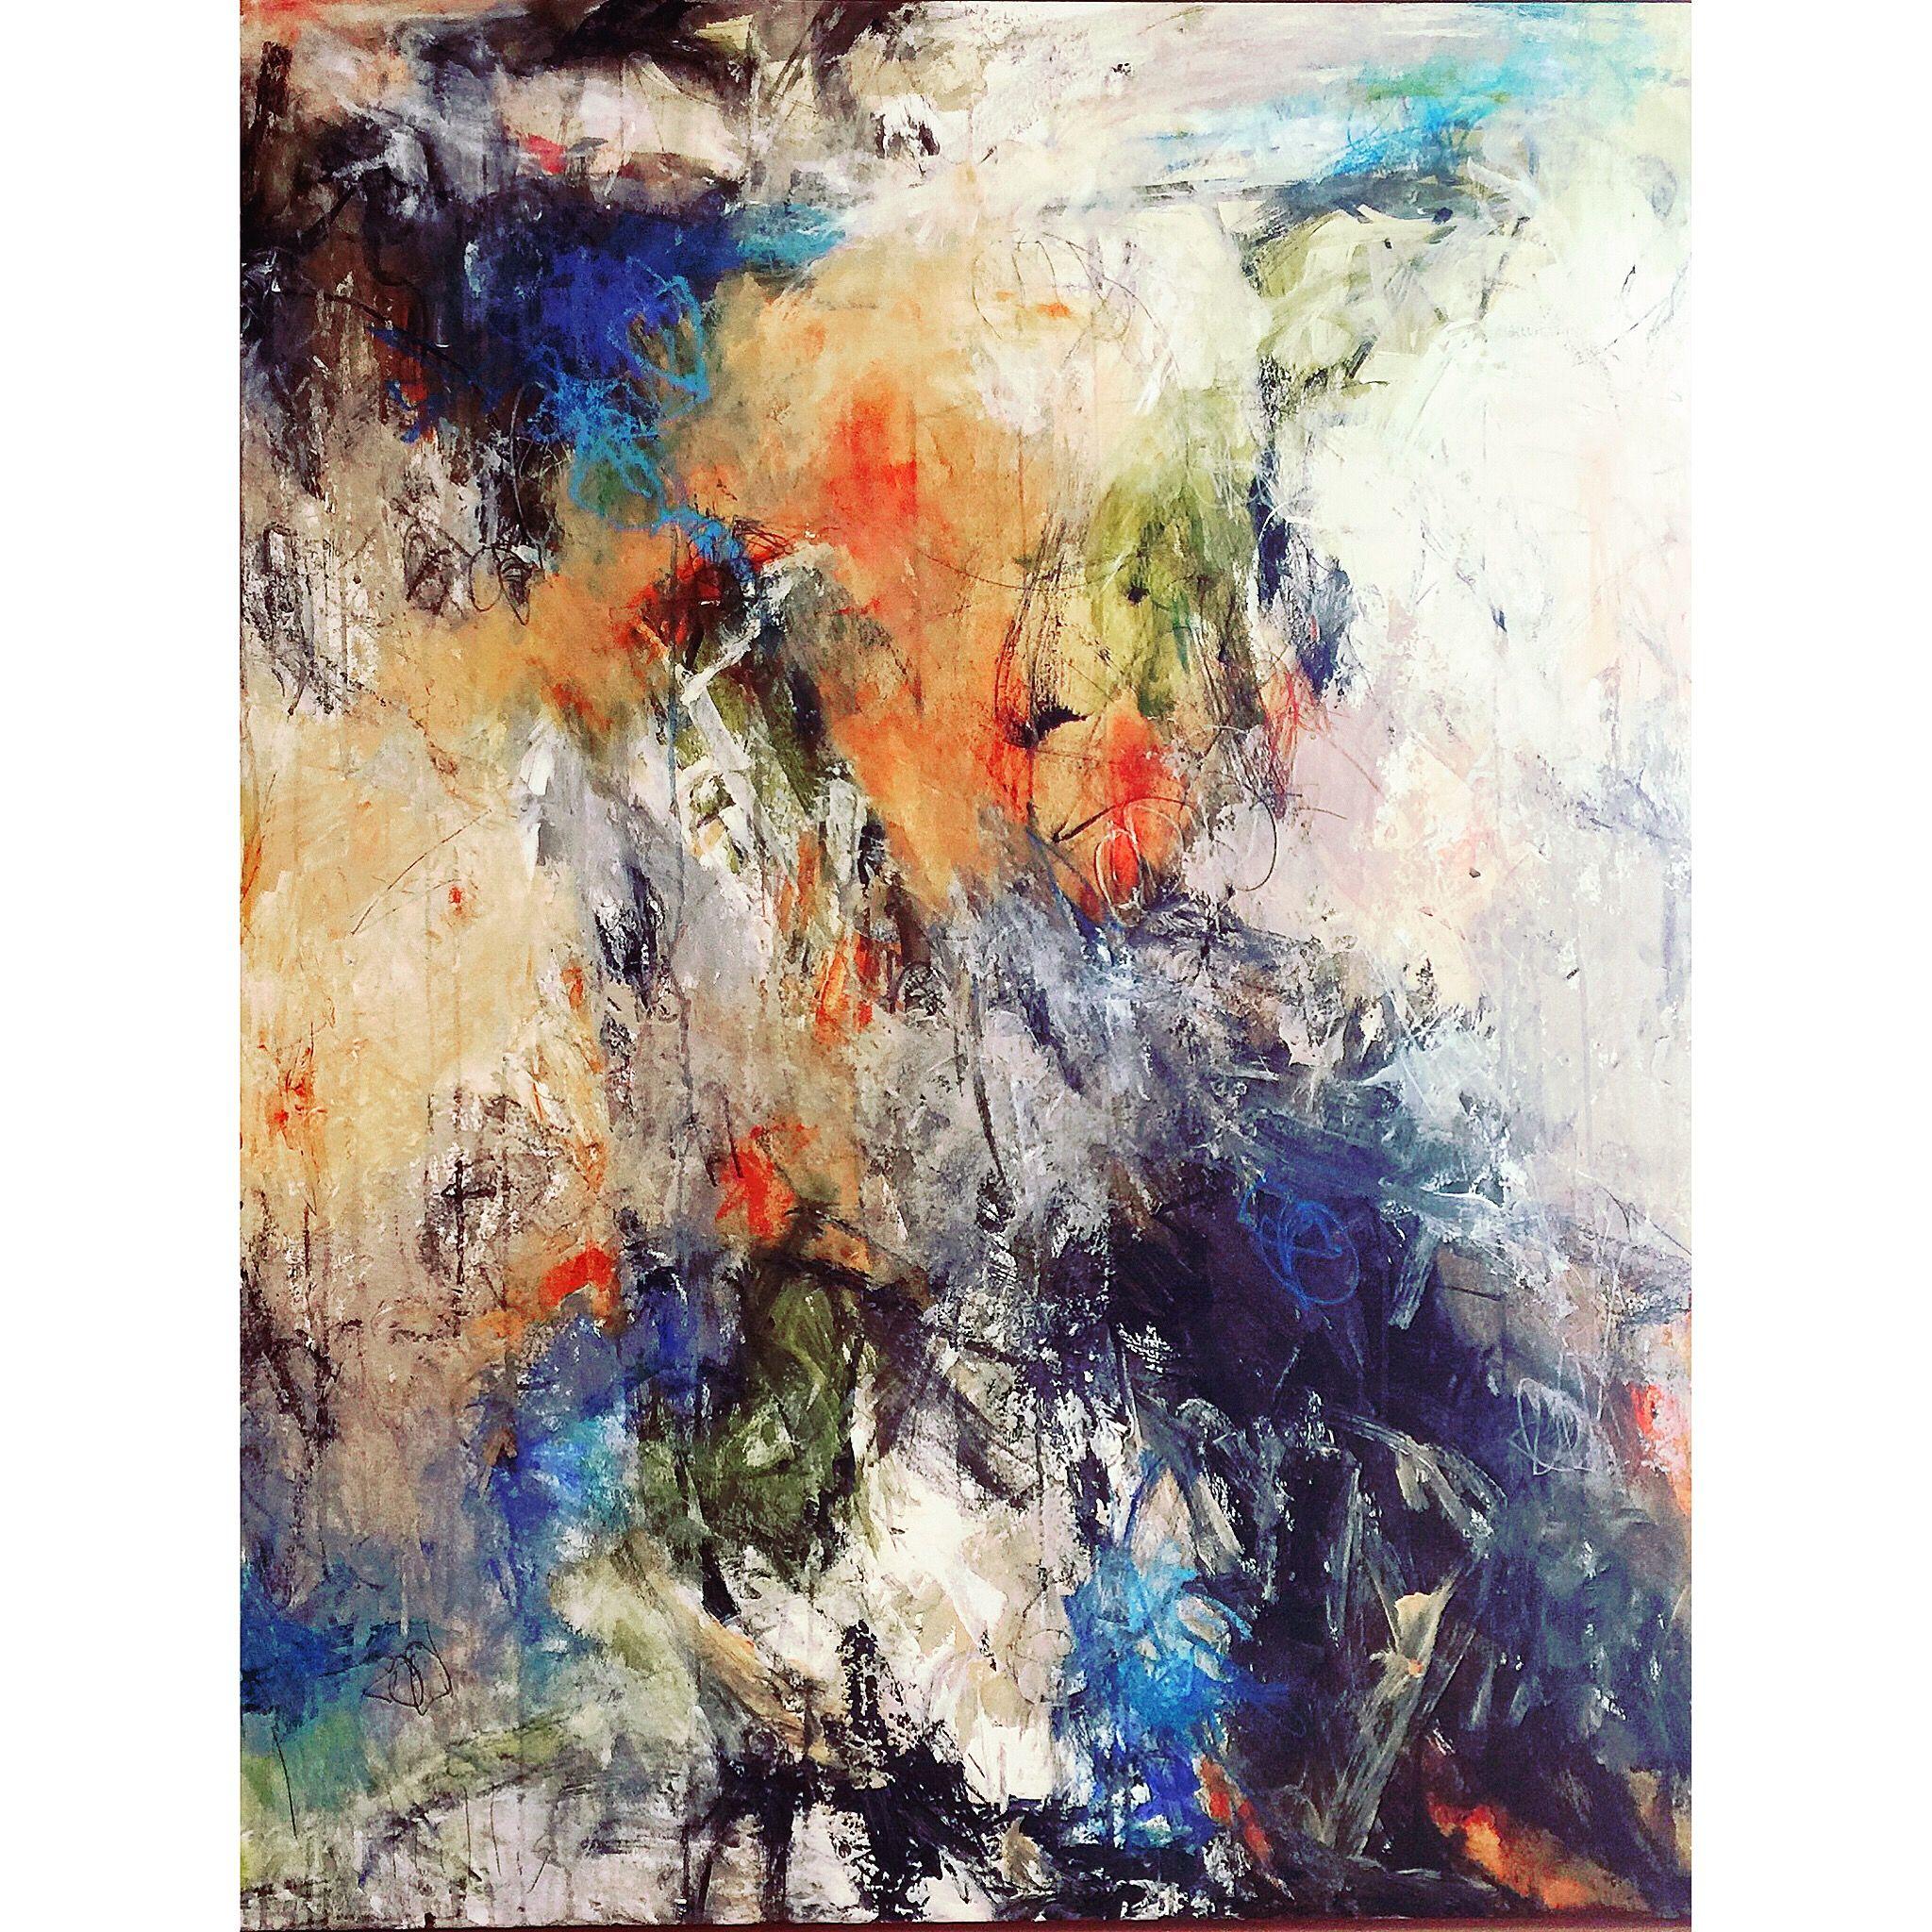 Abstract art | Abstract painting | Mixed media | Nancy Hillis